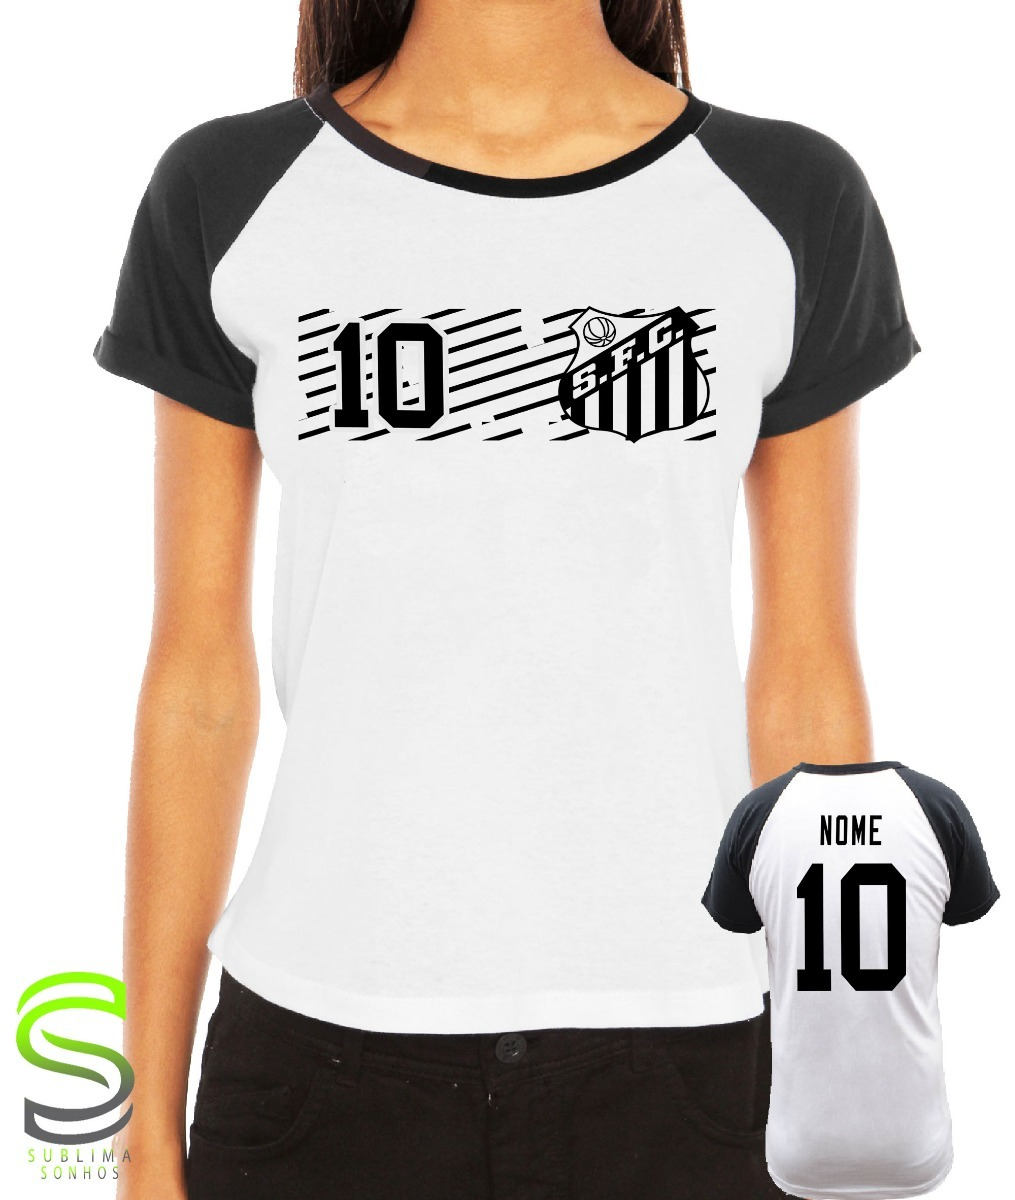 7782e4db5eb59 camiseta santos feminina personalizada. Carregando zoom.